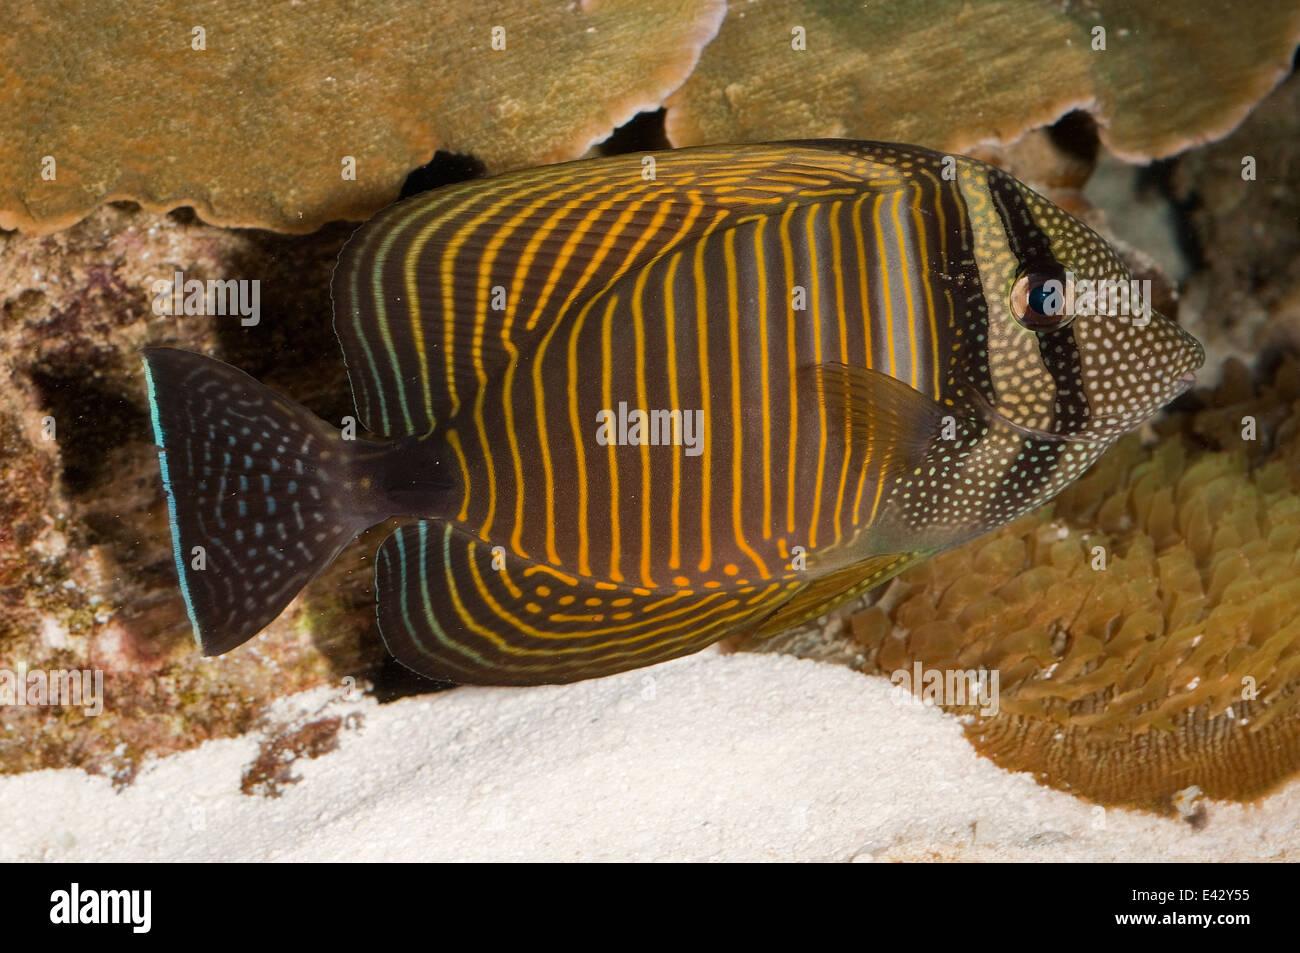 DesJardin der Segelkärpflinge Tag Zebrasoma Desjardinii, Acanthuridae, Indo-Pacifico Ozean Stockbild